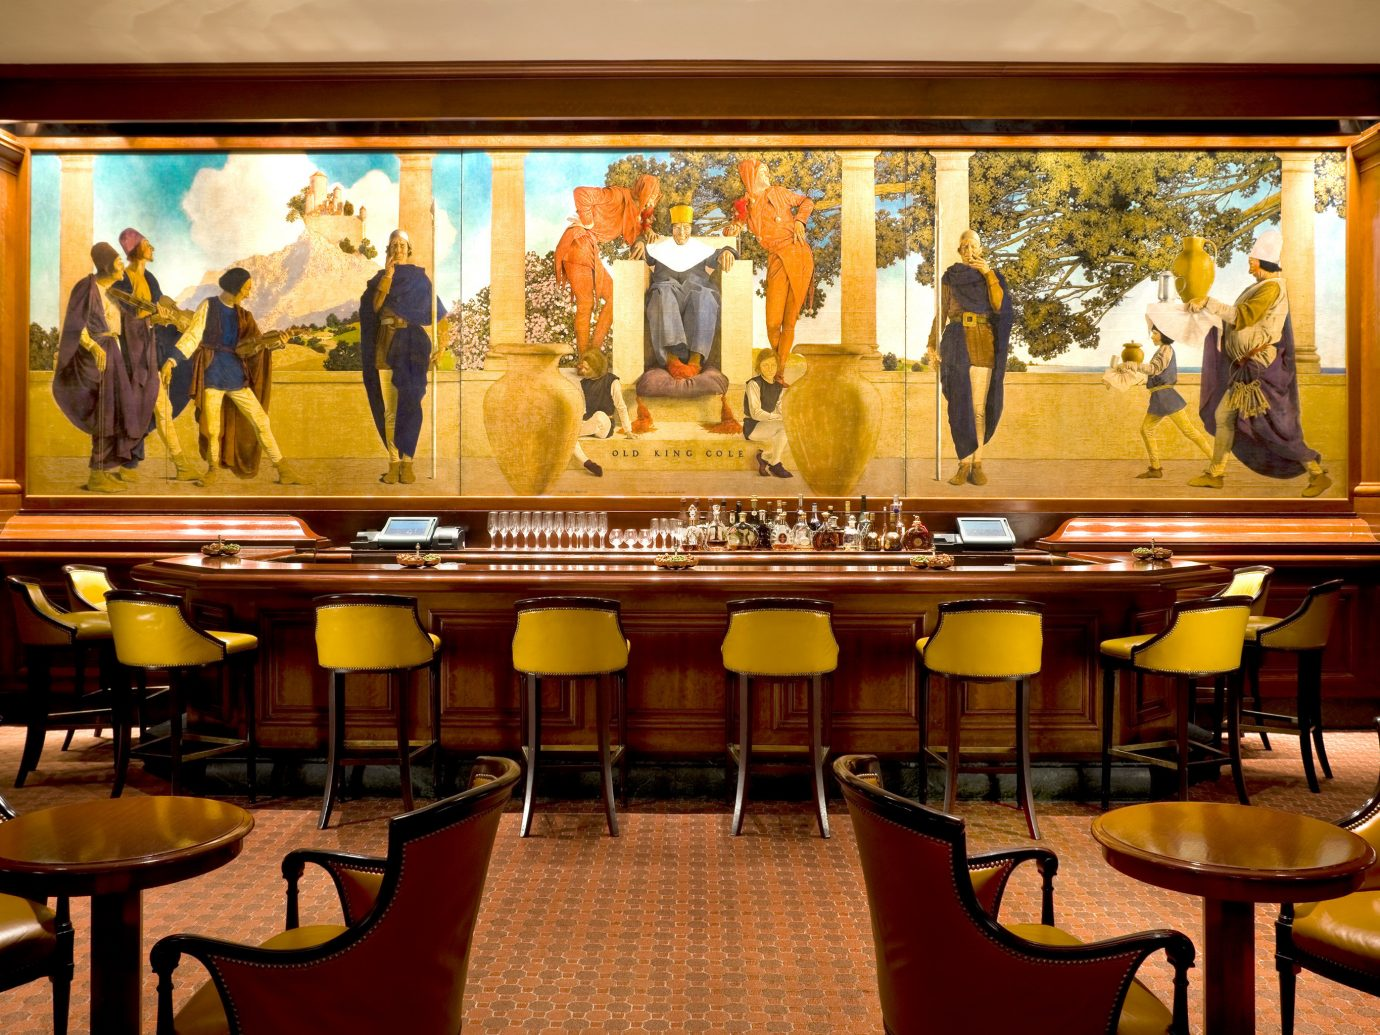 Drink Eat Food + Drink Hotels NYC Trip Ideas indoor room restaurant Bar meal interior design several